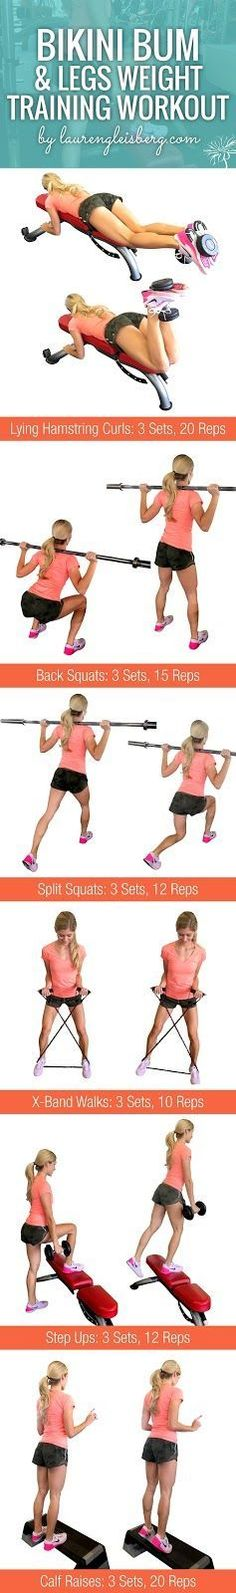 nice Legs & Glutes (ConfidenceKini Challenge) - 4/23 | Lauren Gleisberg | Happiness, Health, & Fitness